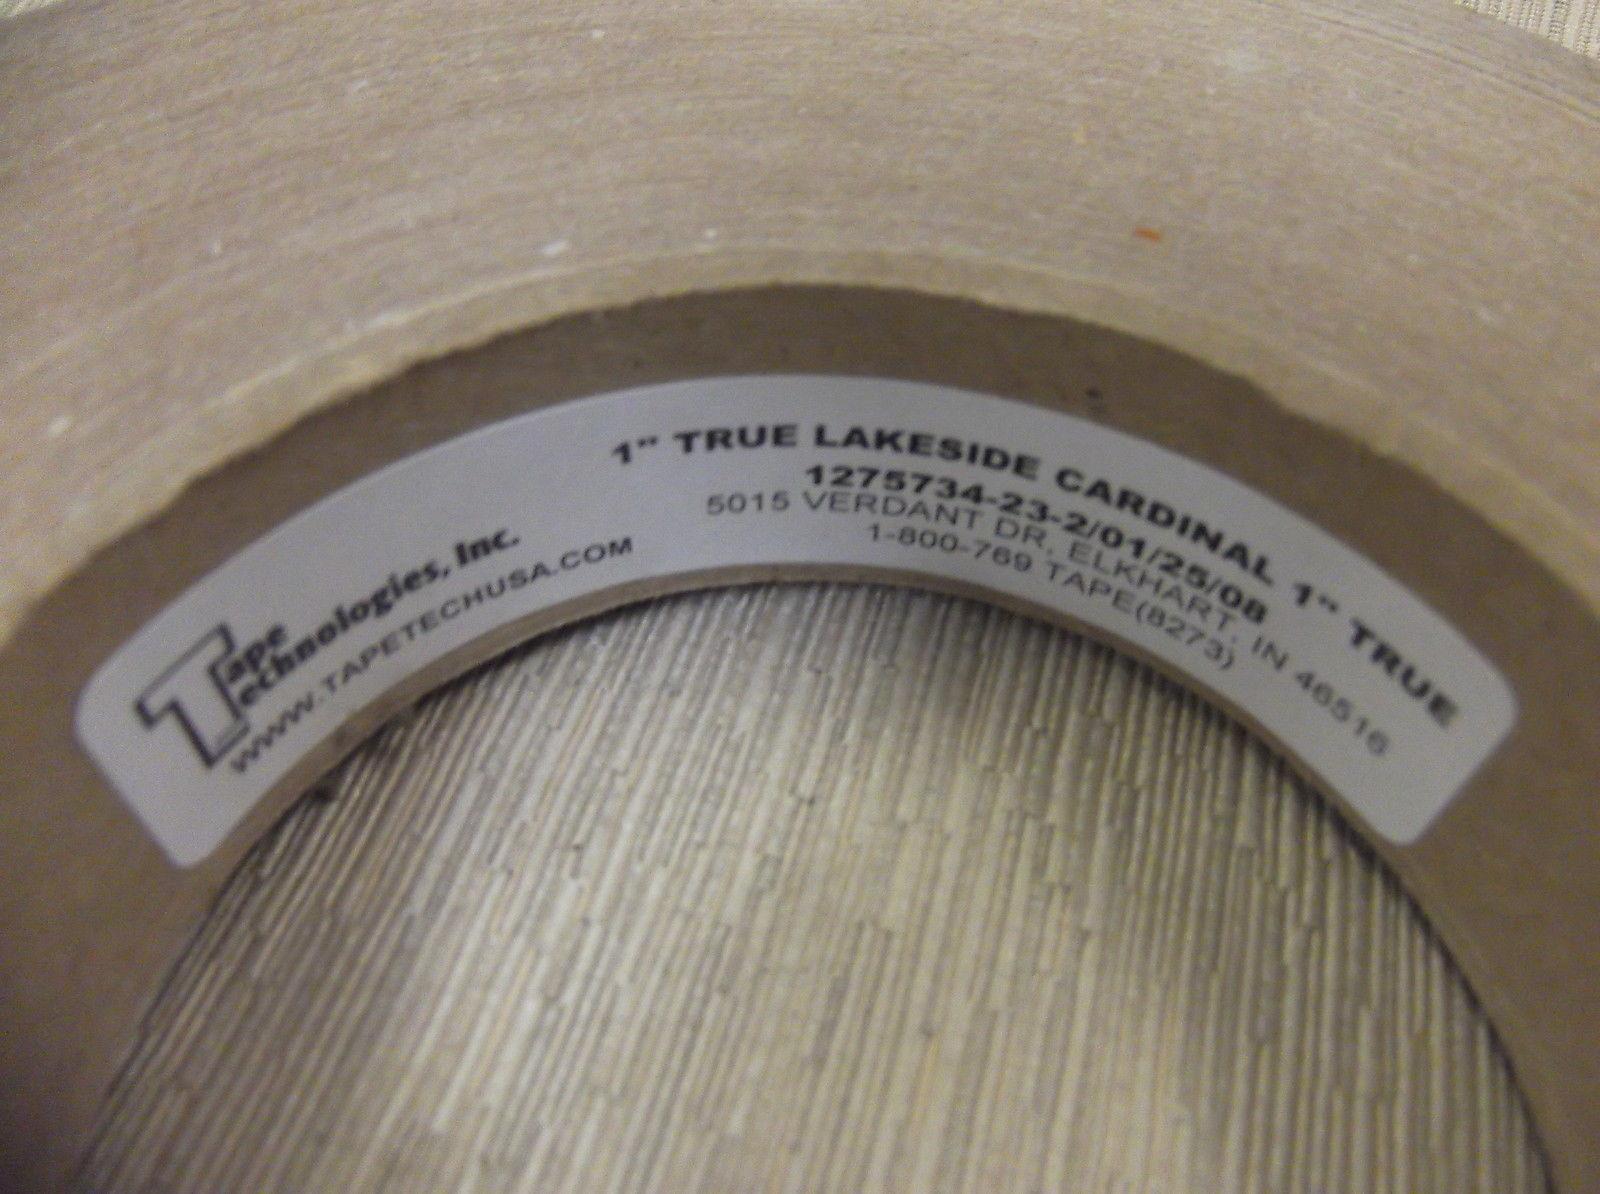 "Tape Technologies Lakeside Cardinal Seam Tape 1"" X 150' #127573423 UPC:710534472"